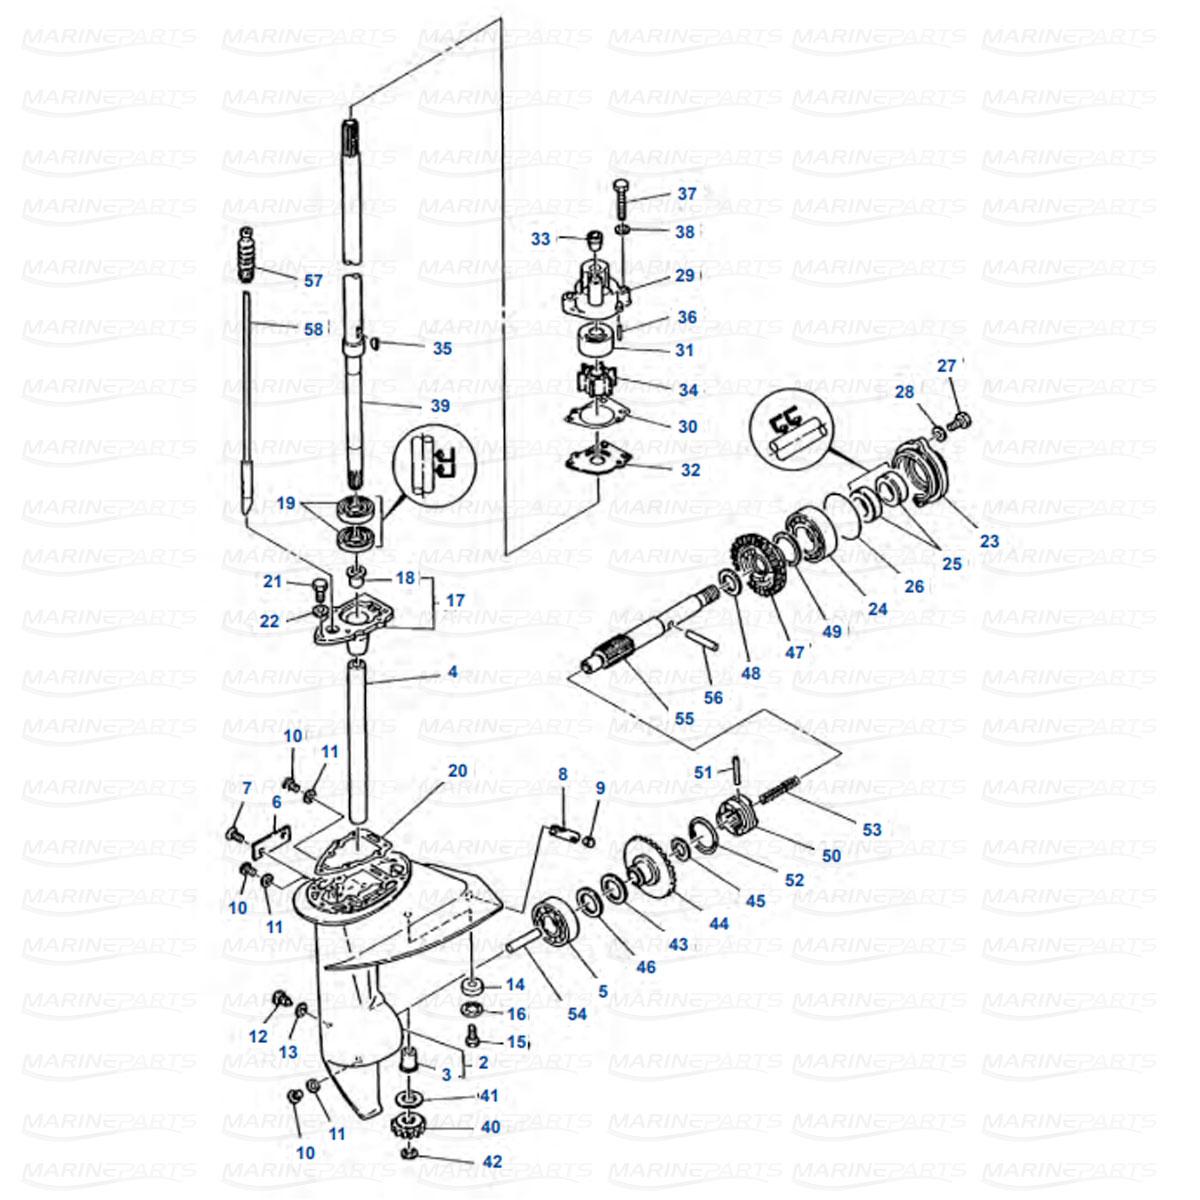 Gearcase parts Yamaha E8D 2-stroke